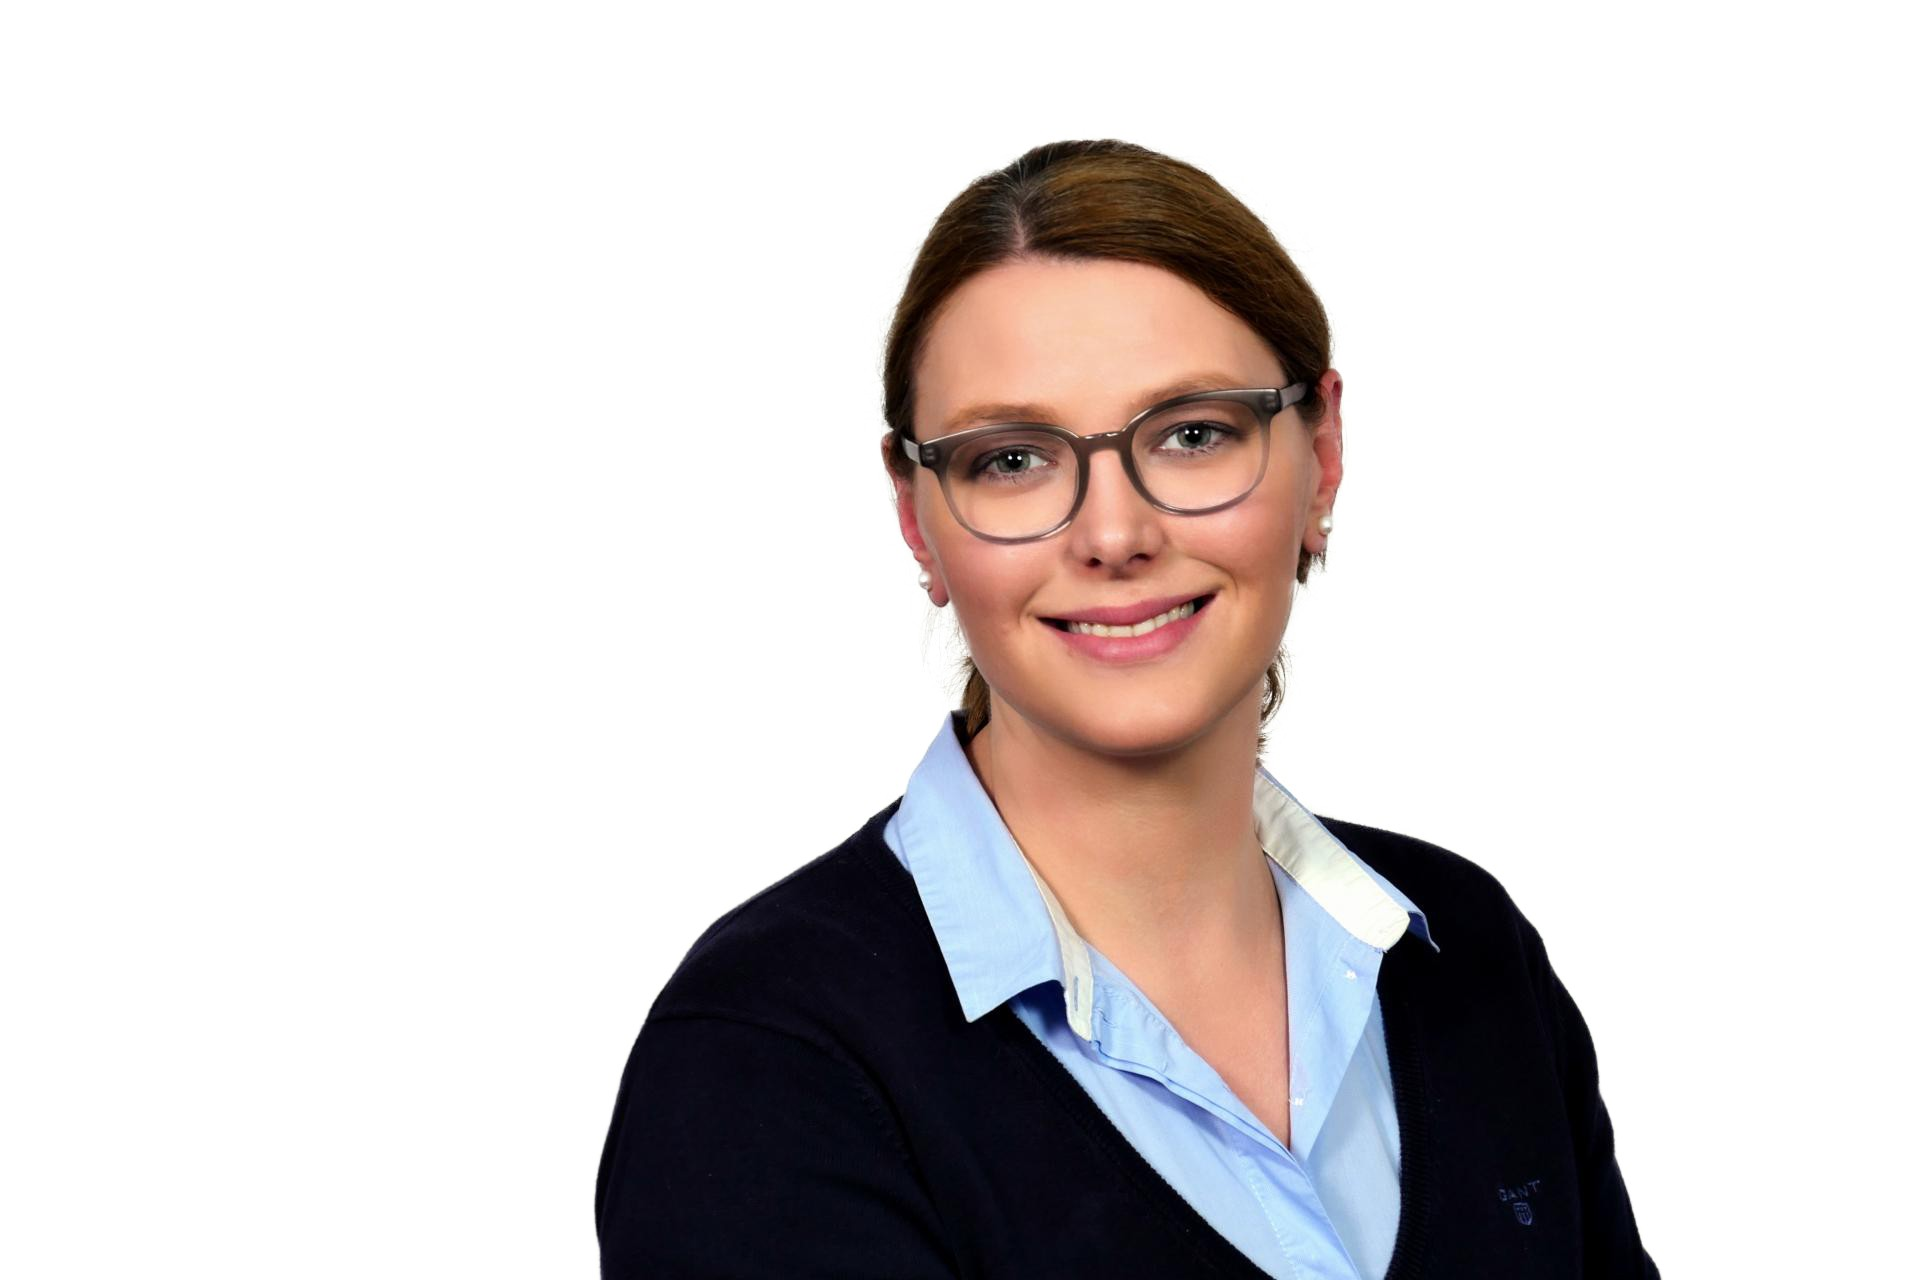 Svea Karlström Portrait - Kinder- un Jugendhilfe tibb